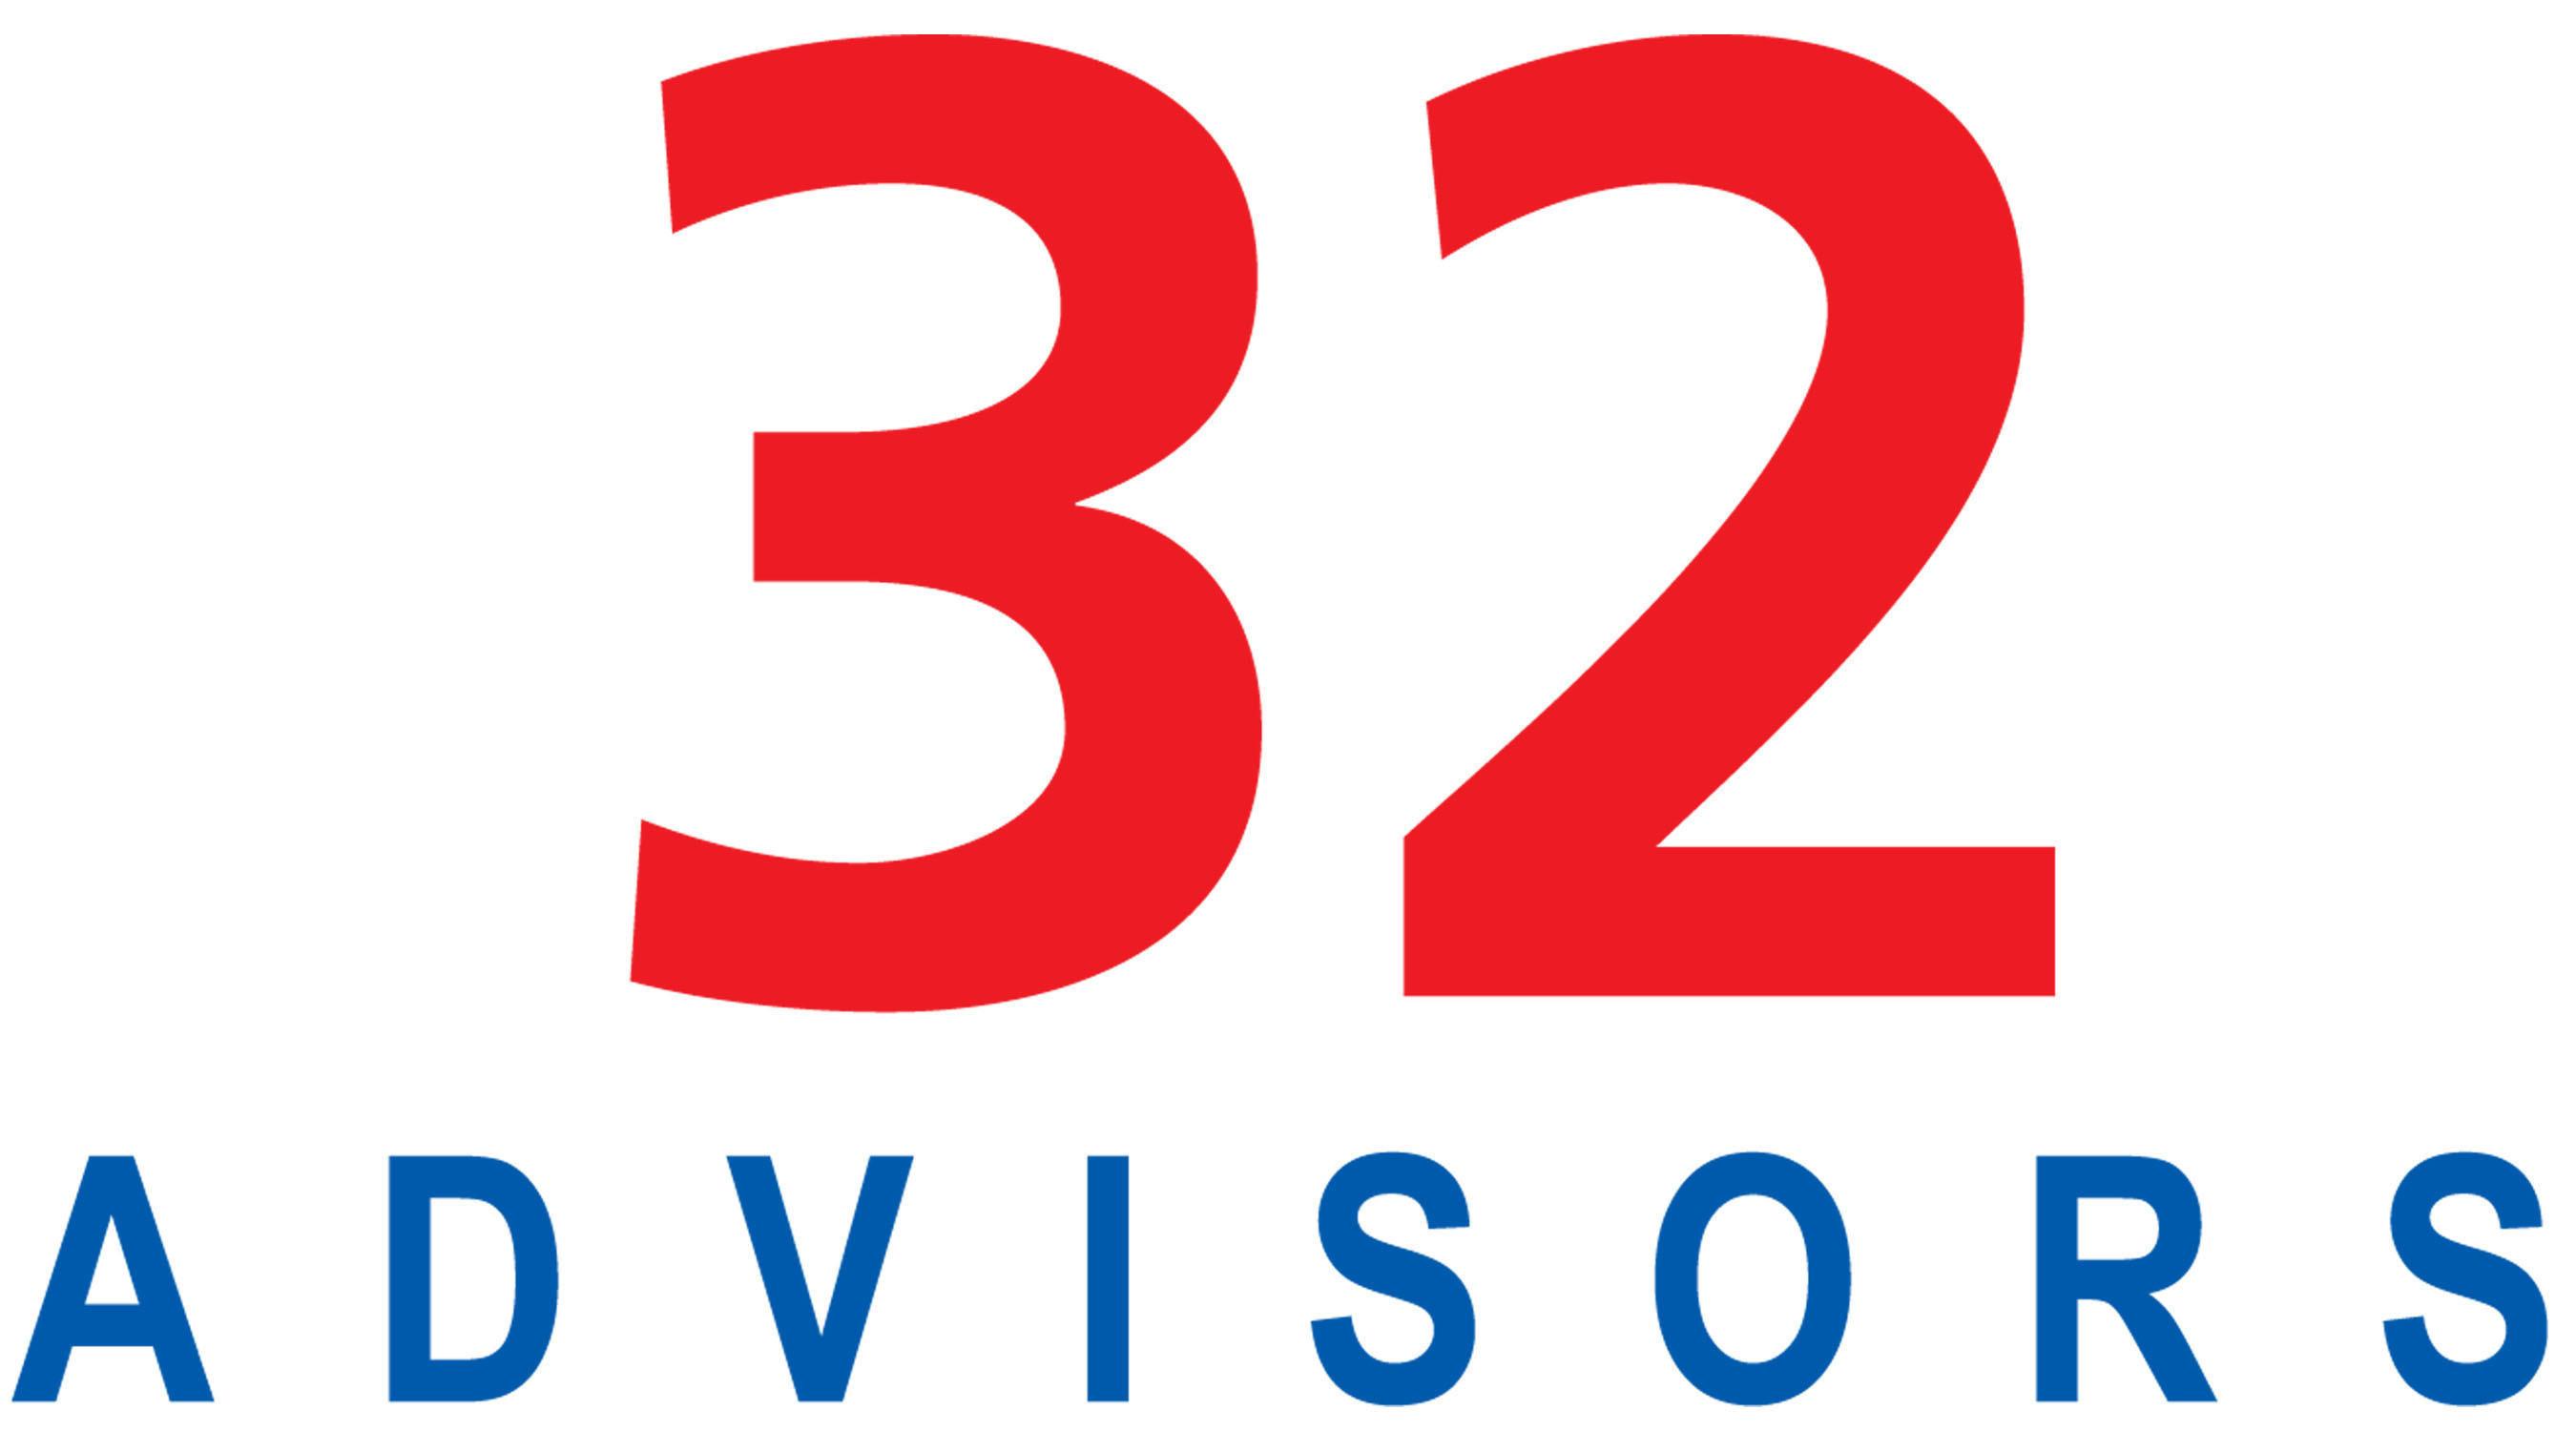 32 Advisors